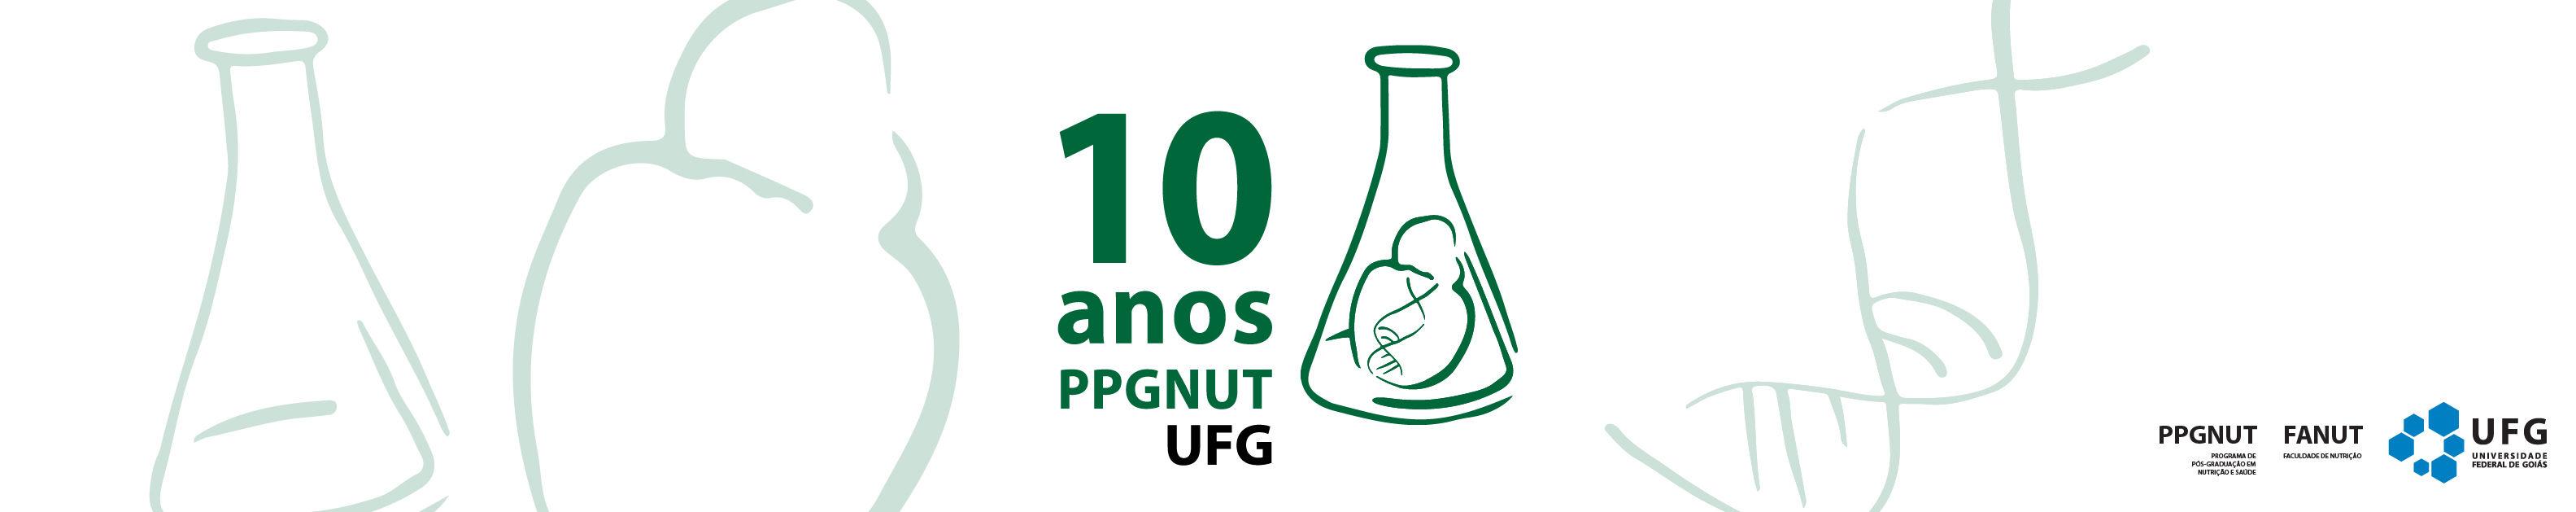 ppgnut-10-anos-topo-site